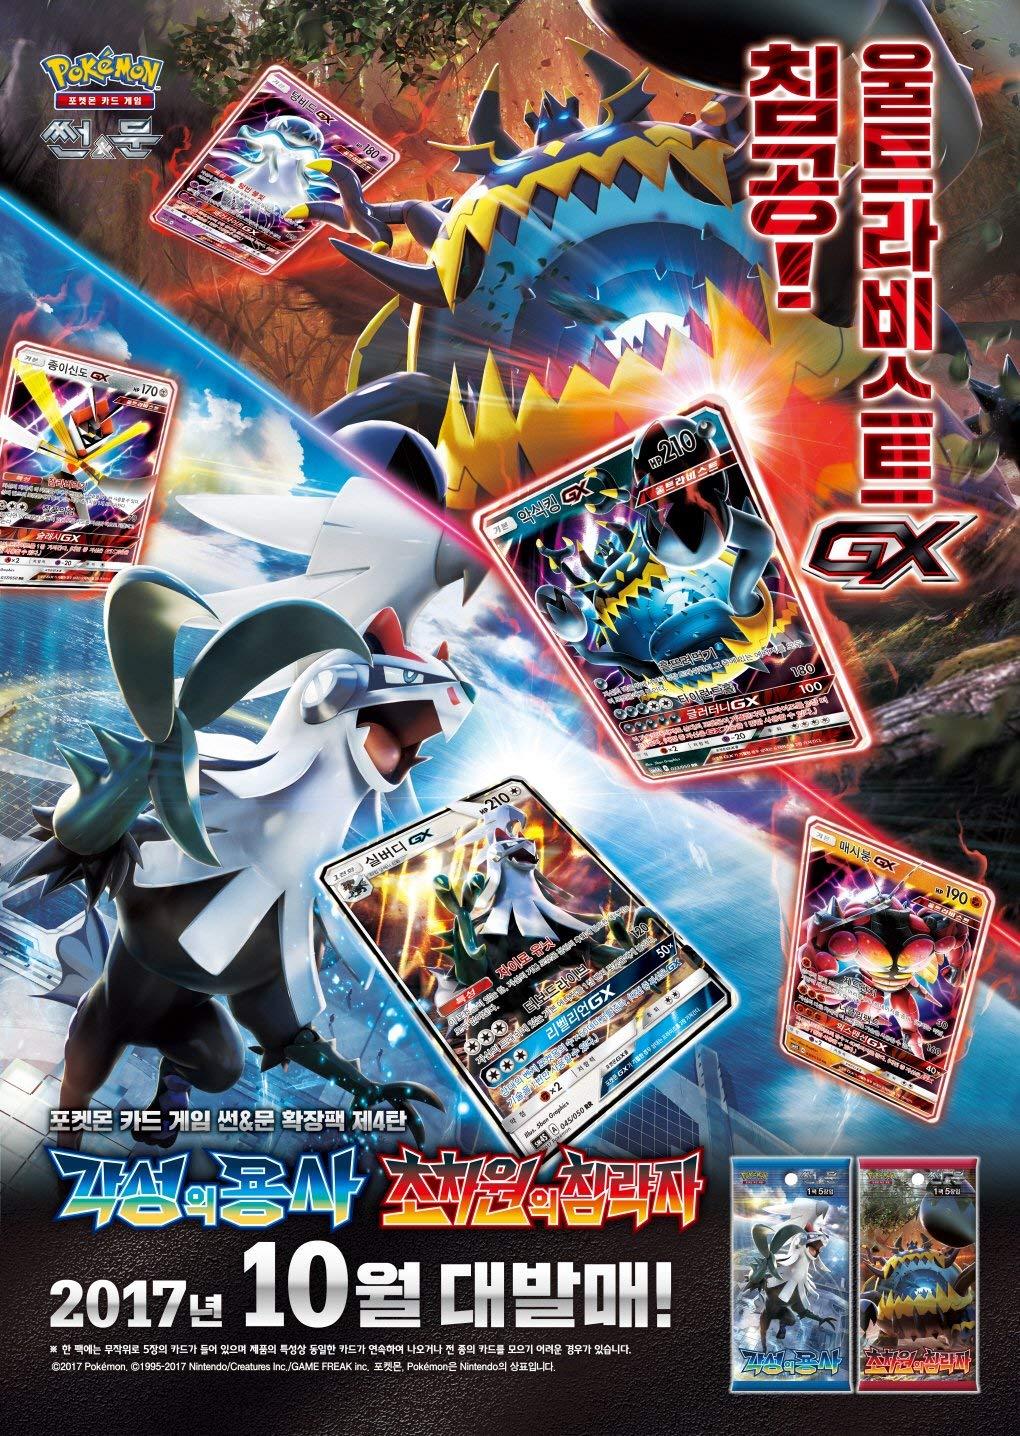 3pcs Premium Card Sleeve Corea Ver TCG The Transdimensional Beast The Transdimensional Beast Pokemon Cartas Sun /& Moon Booster Pack Caja 30 Packs